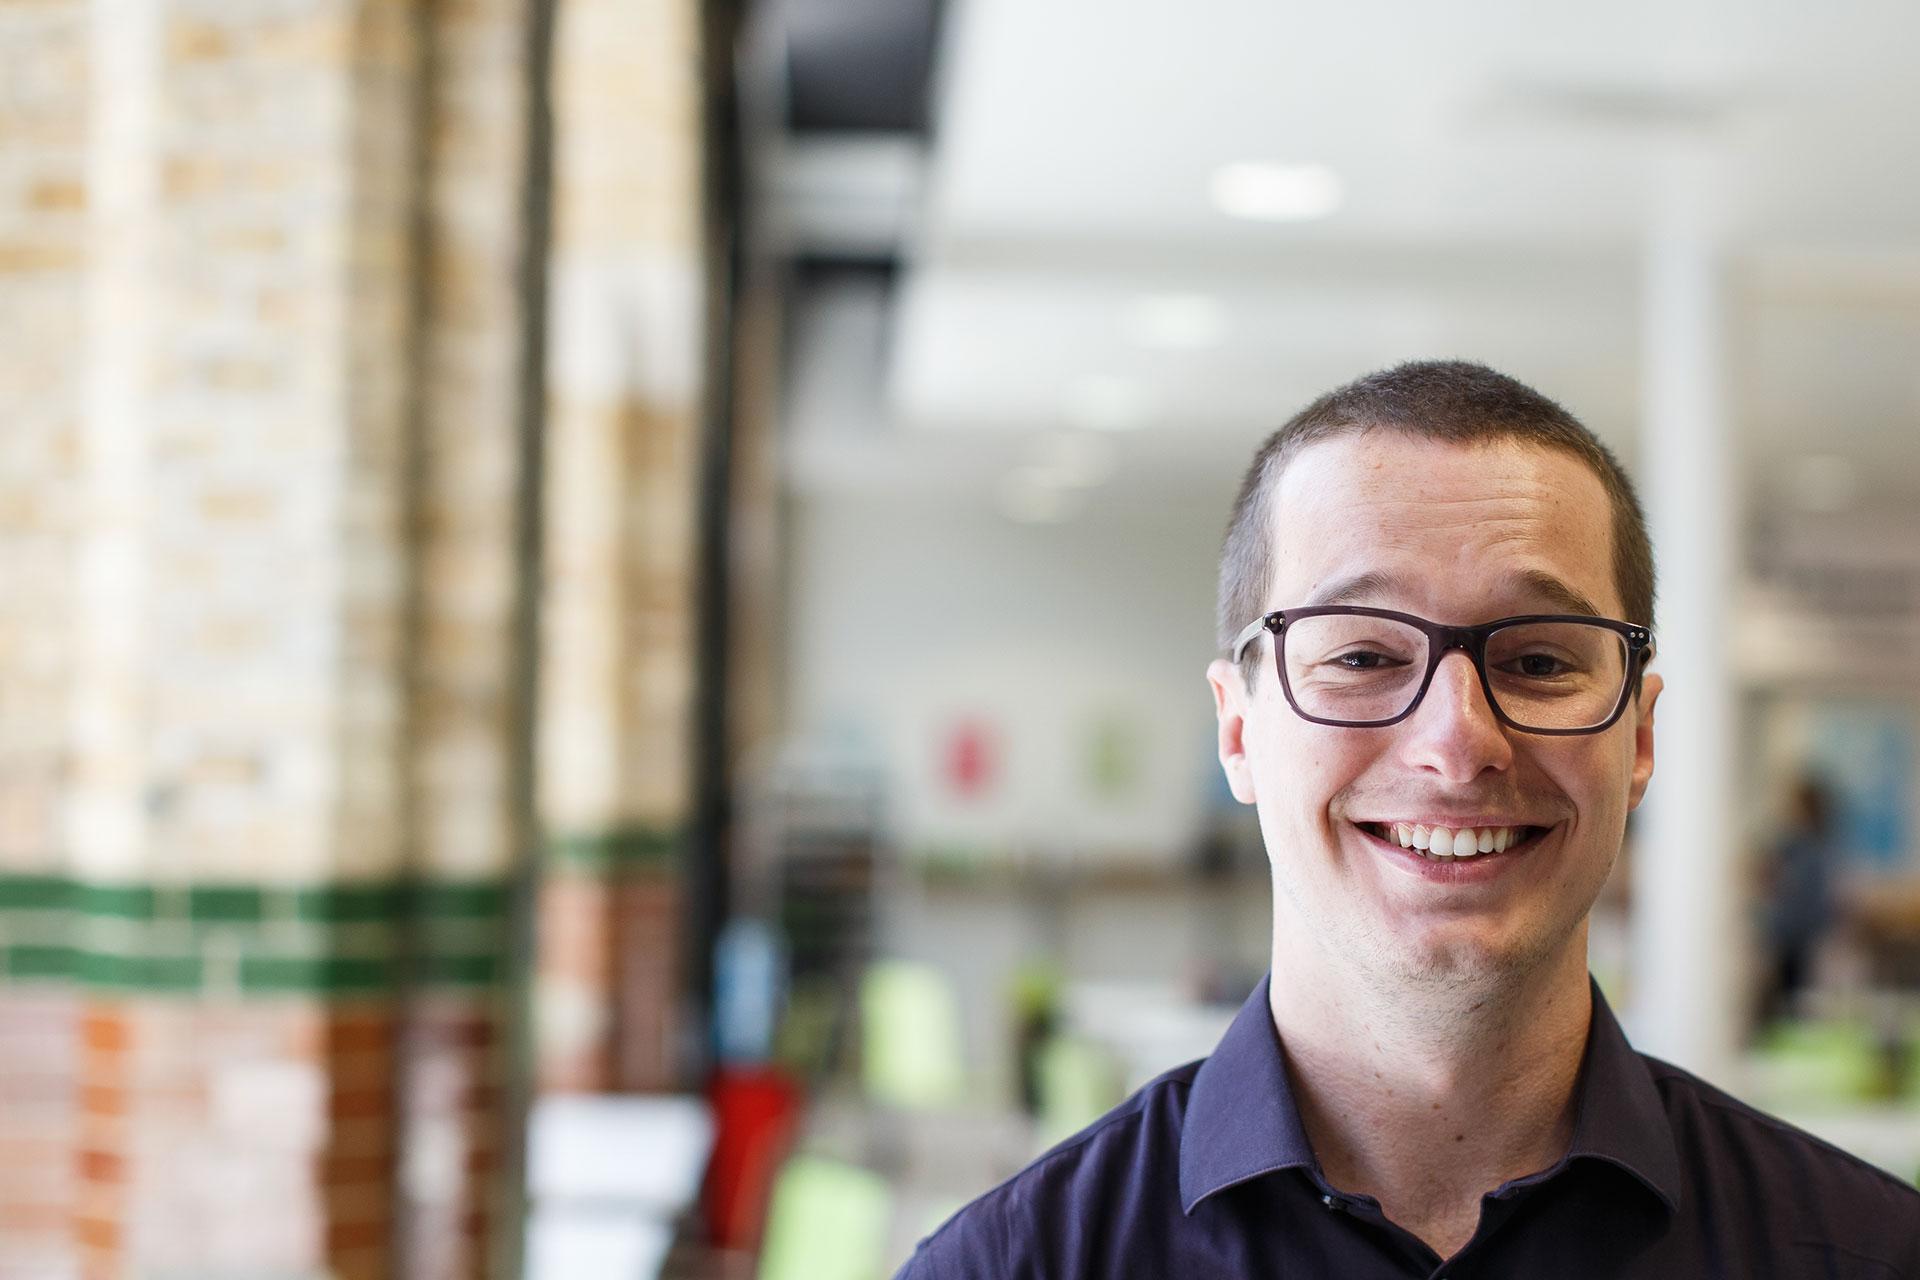 Computing student Alex Bitsios